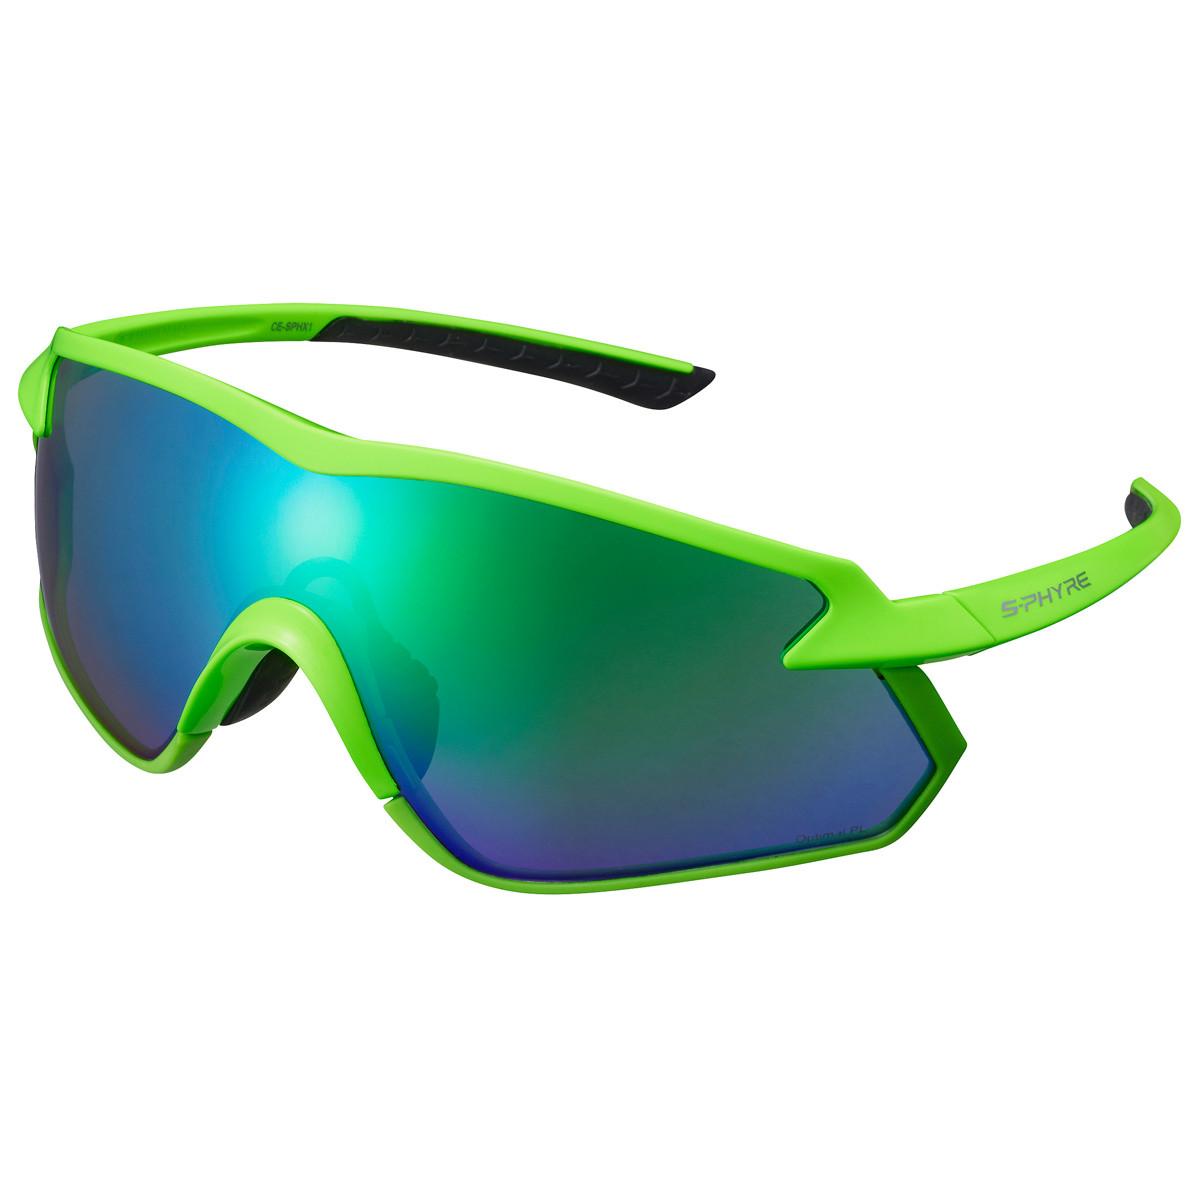 Shimano S-Phyre X Cykel Tilbehør||> Cykelbriller||> Shimano Cykelbriller||Solbriller